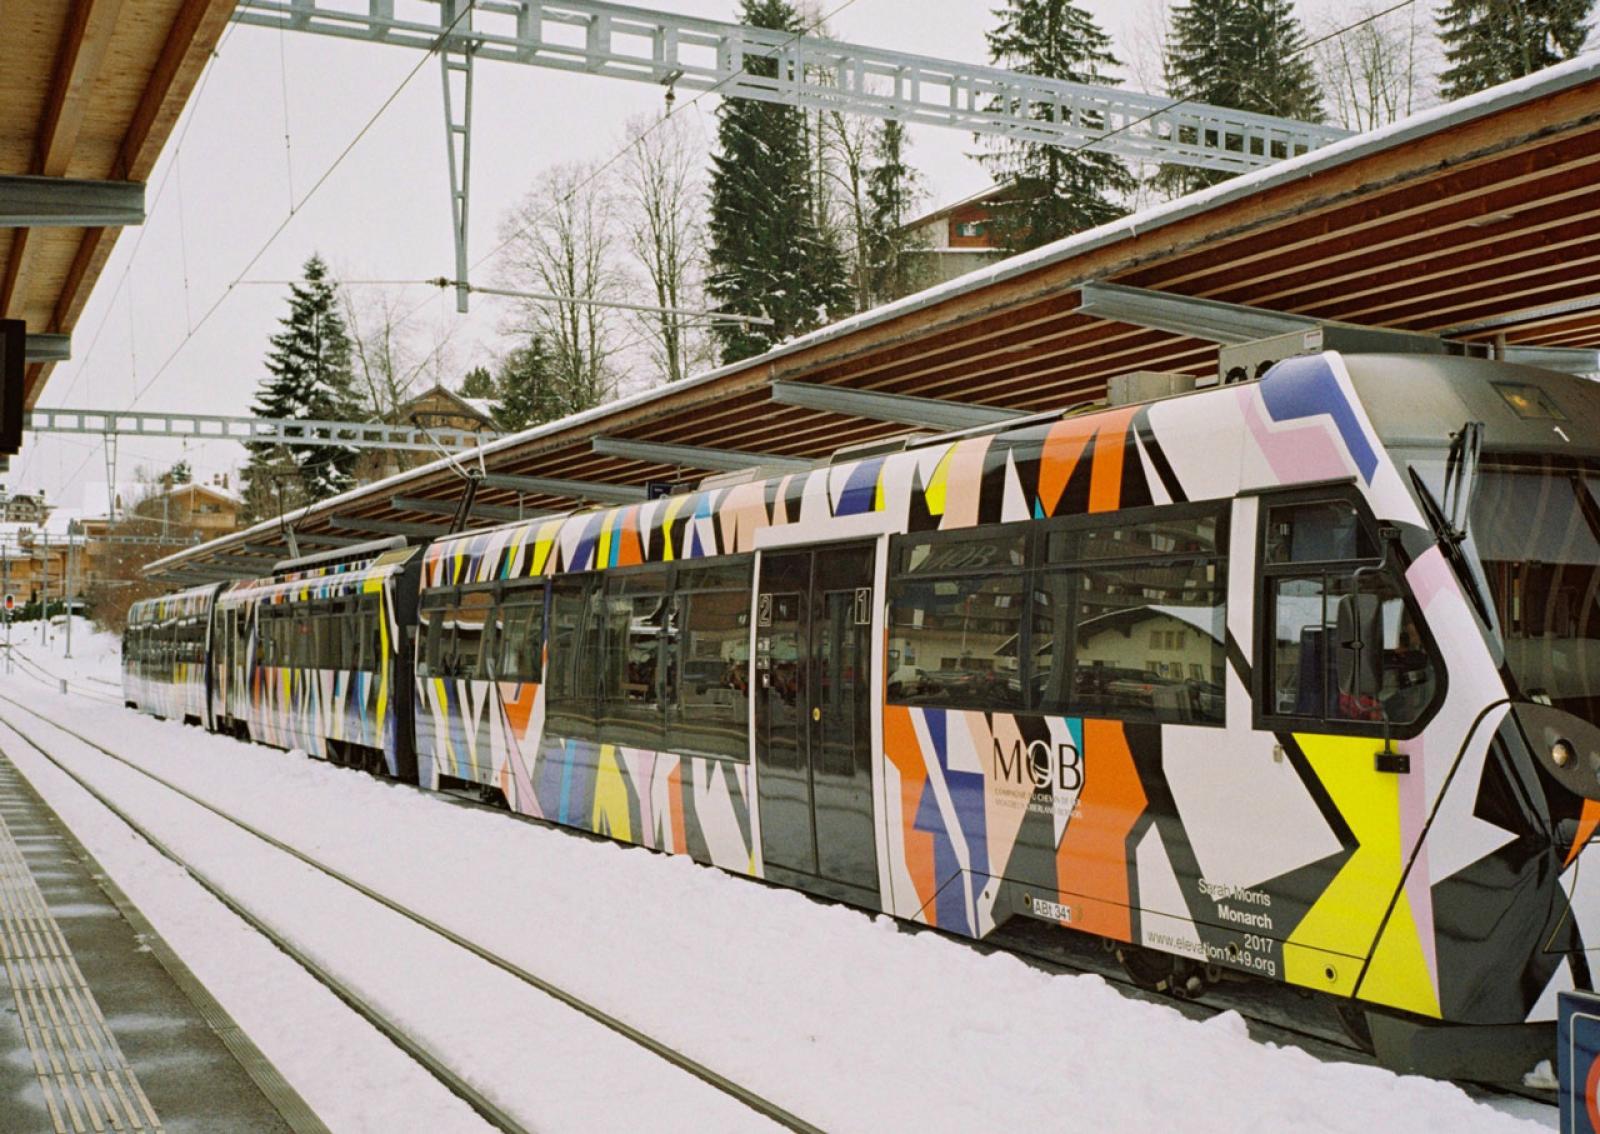 Sarah Morris /Monarch/, 2017 The train runs daily between Montreux and Zweisimmen.